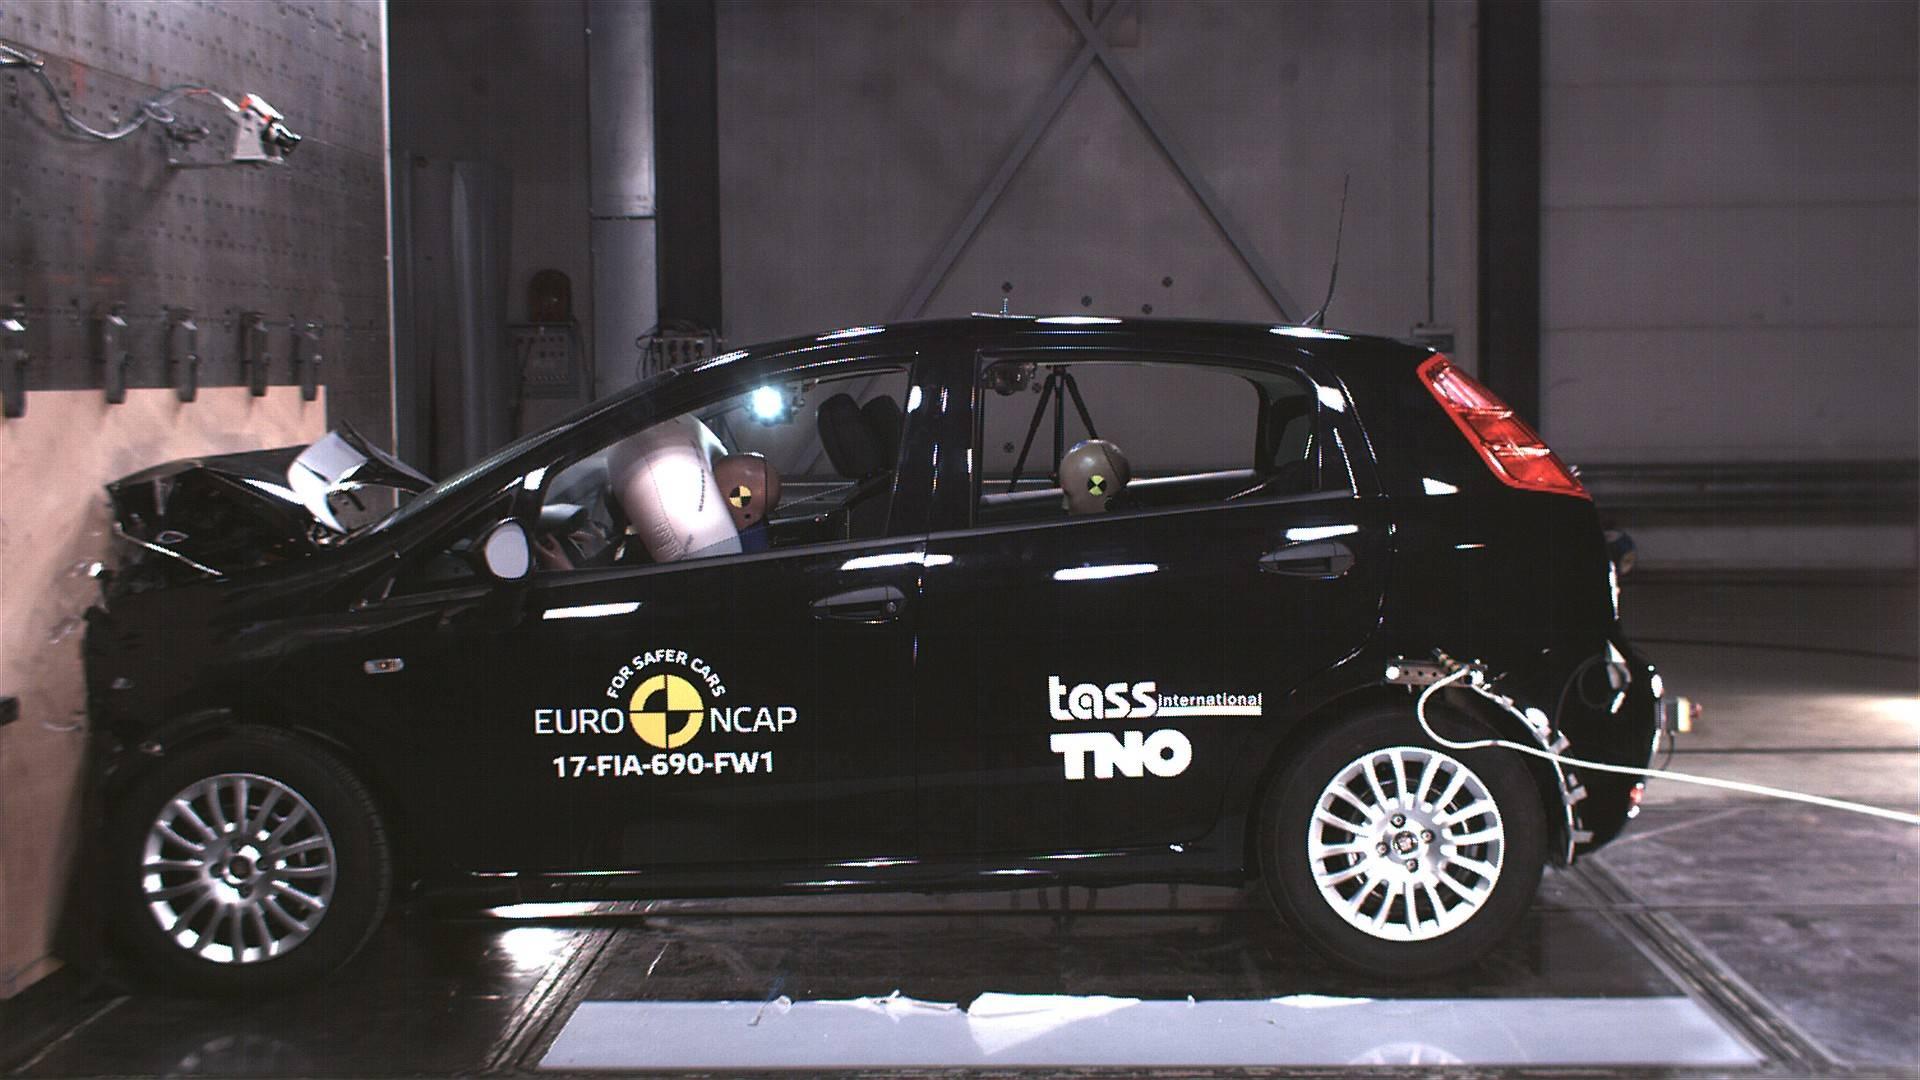 crash punto new excels leaf as introduces strict news aeb euro test fiat nissan ncap